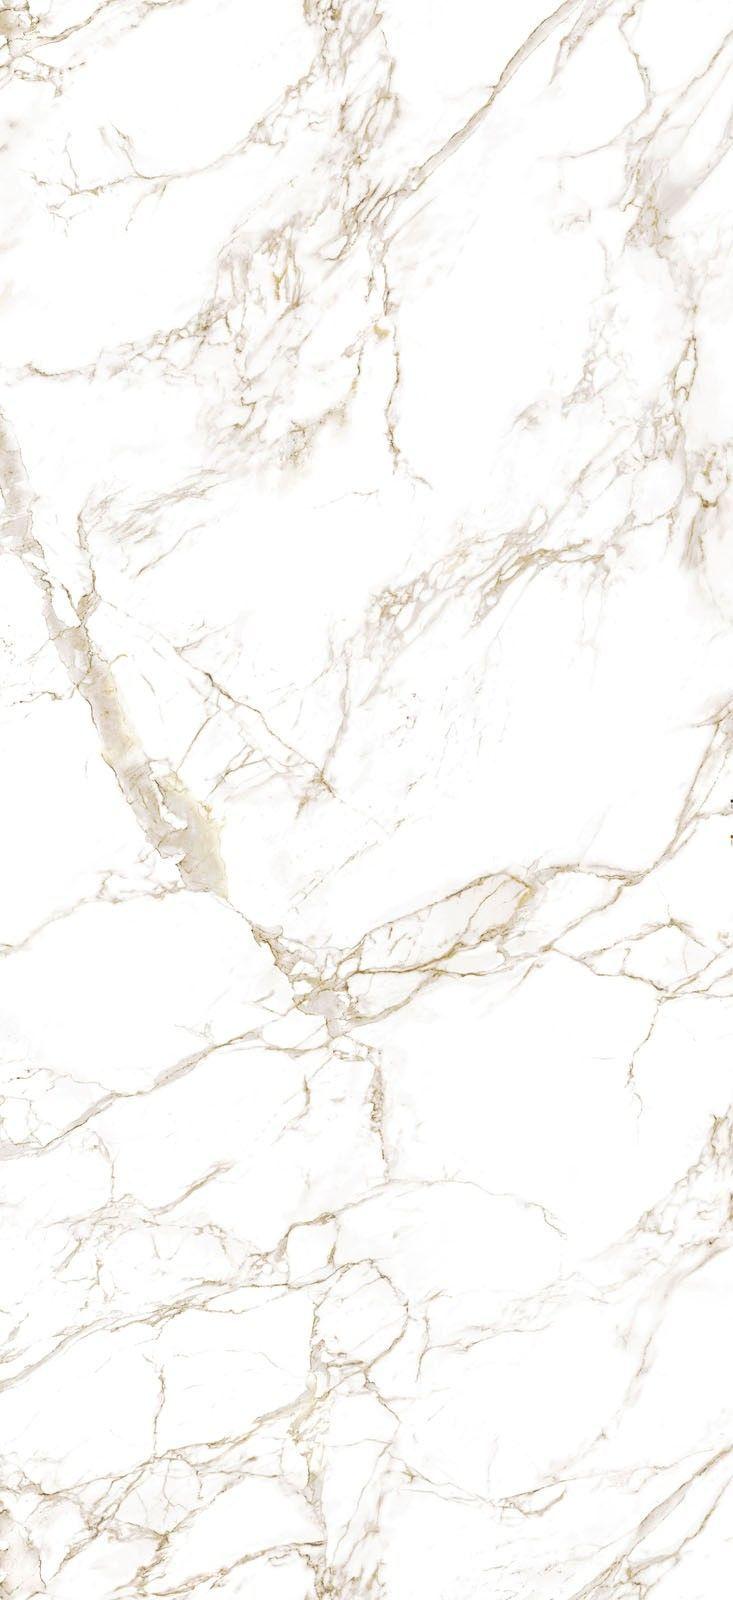 Marble Texture Marble Marbre Texture Marble Texture